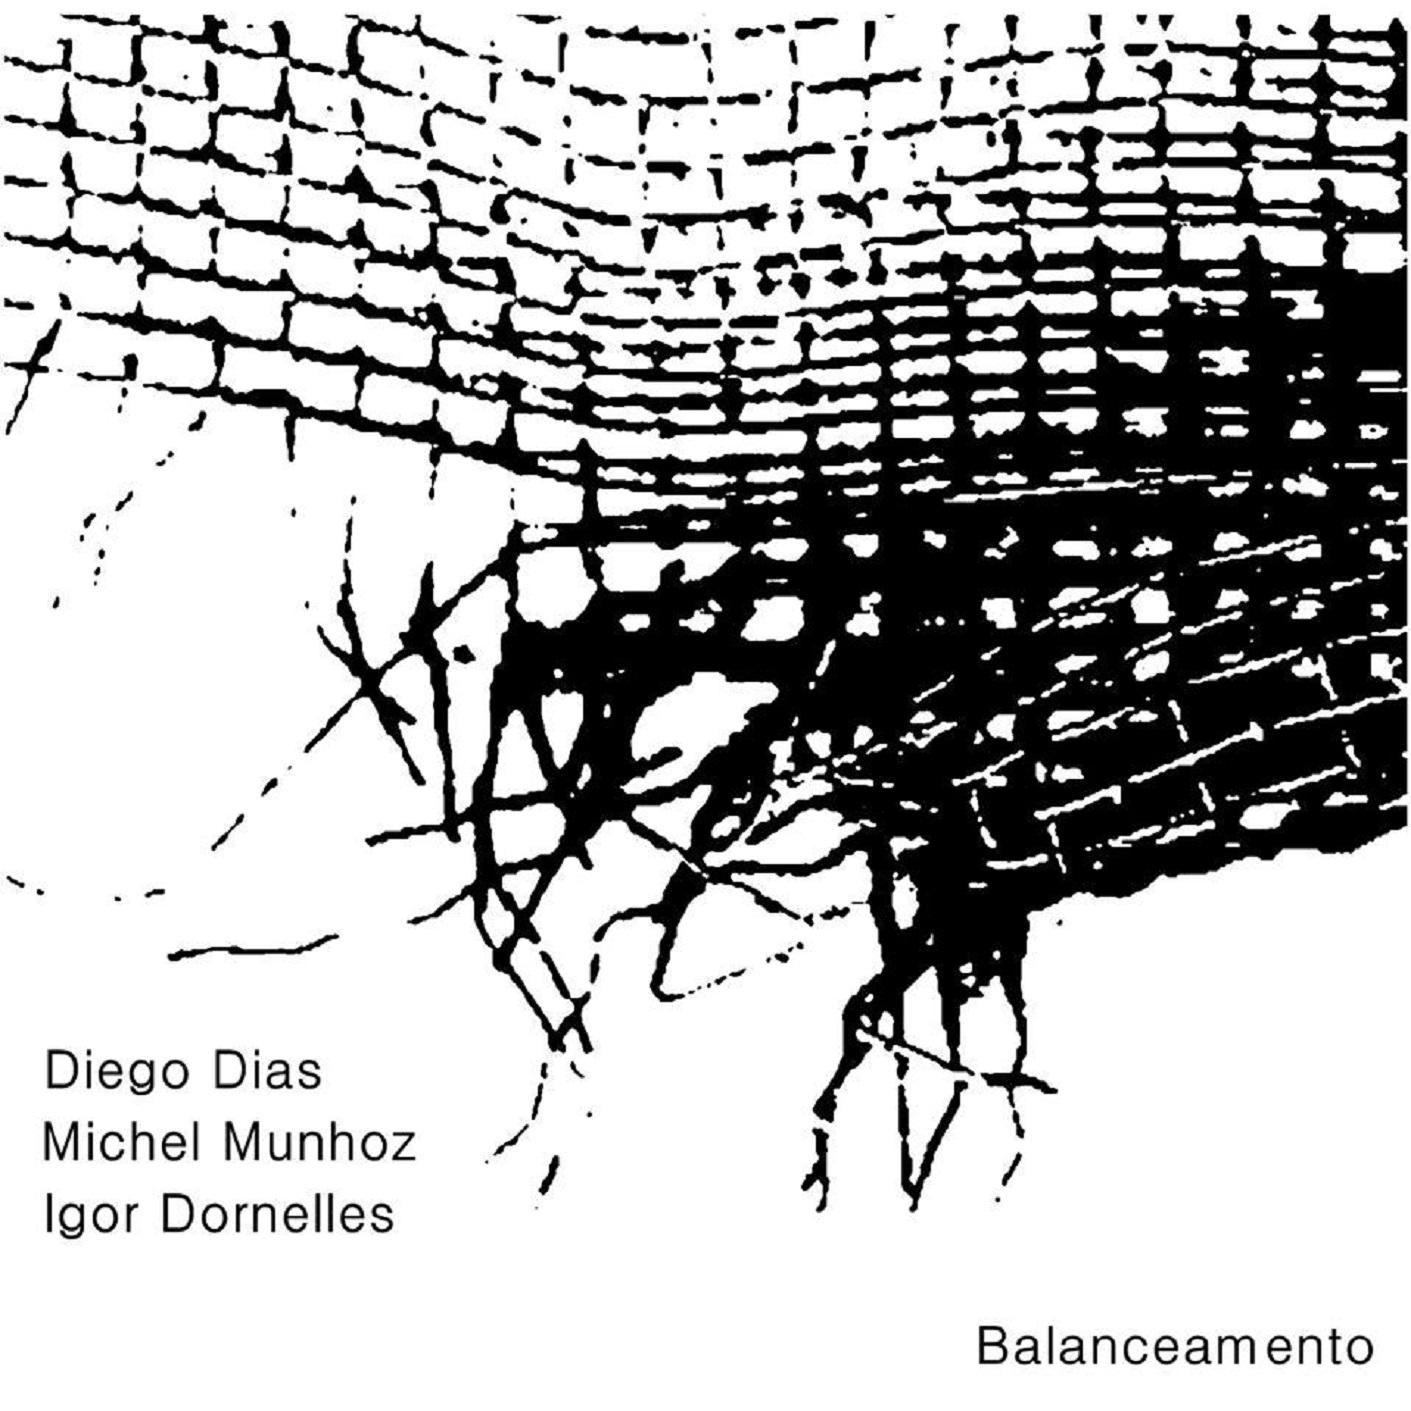 MSRCD078 - Dias/Munhoz/Dornelles - Balanceamento